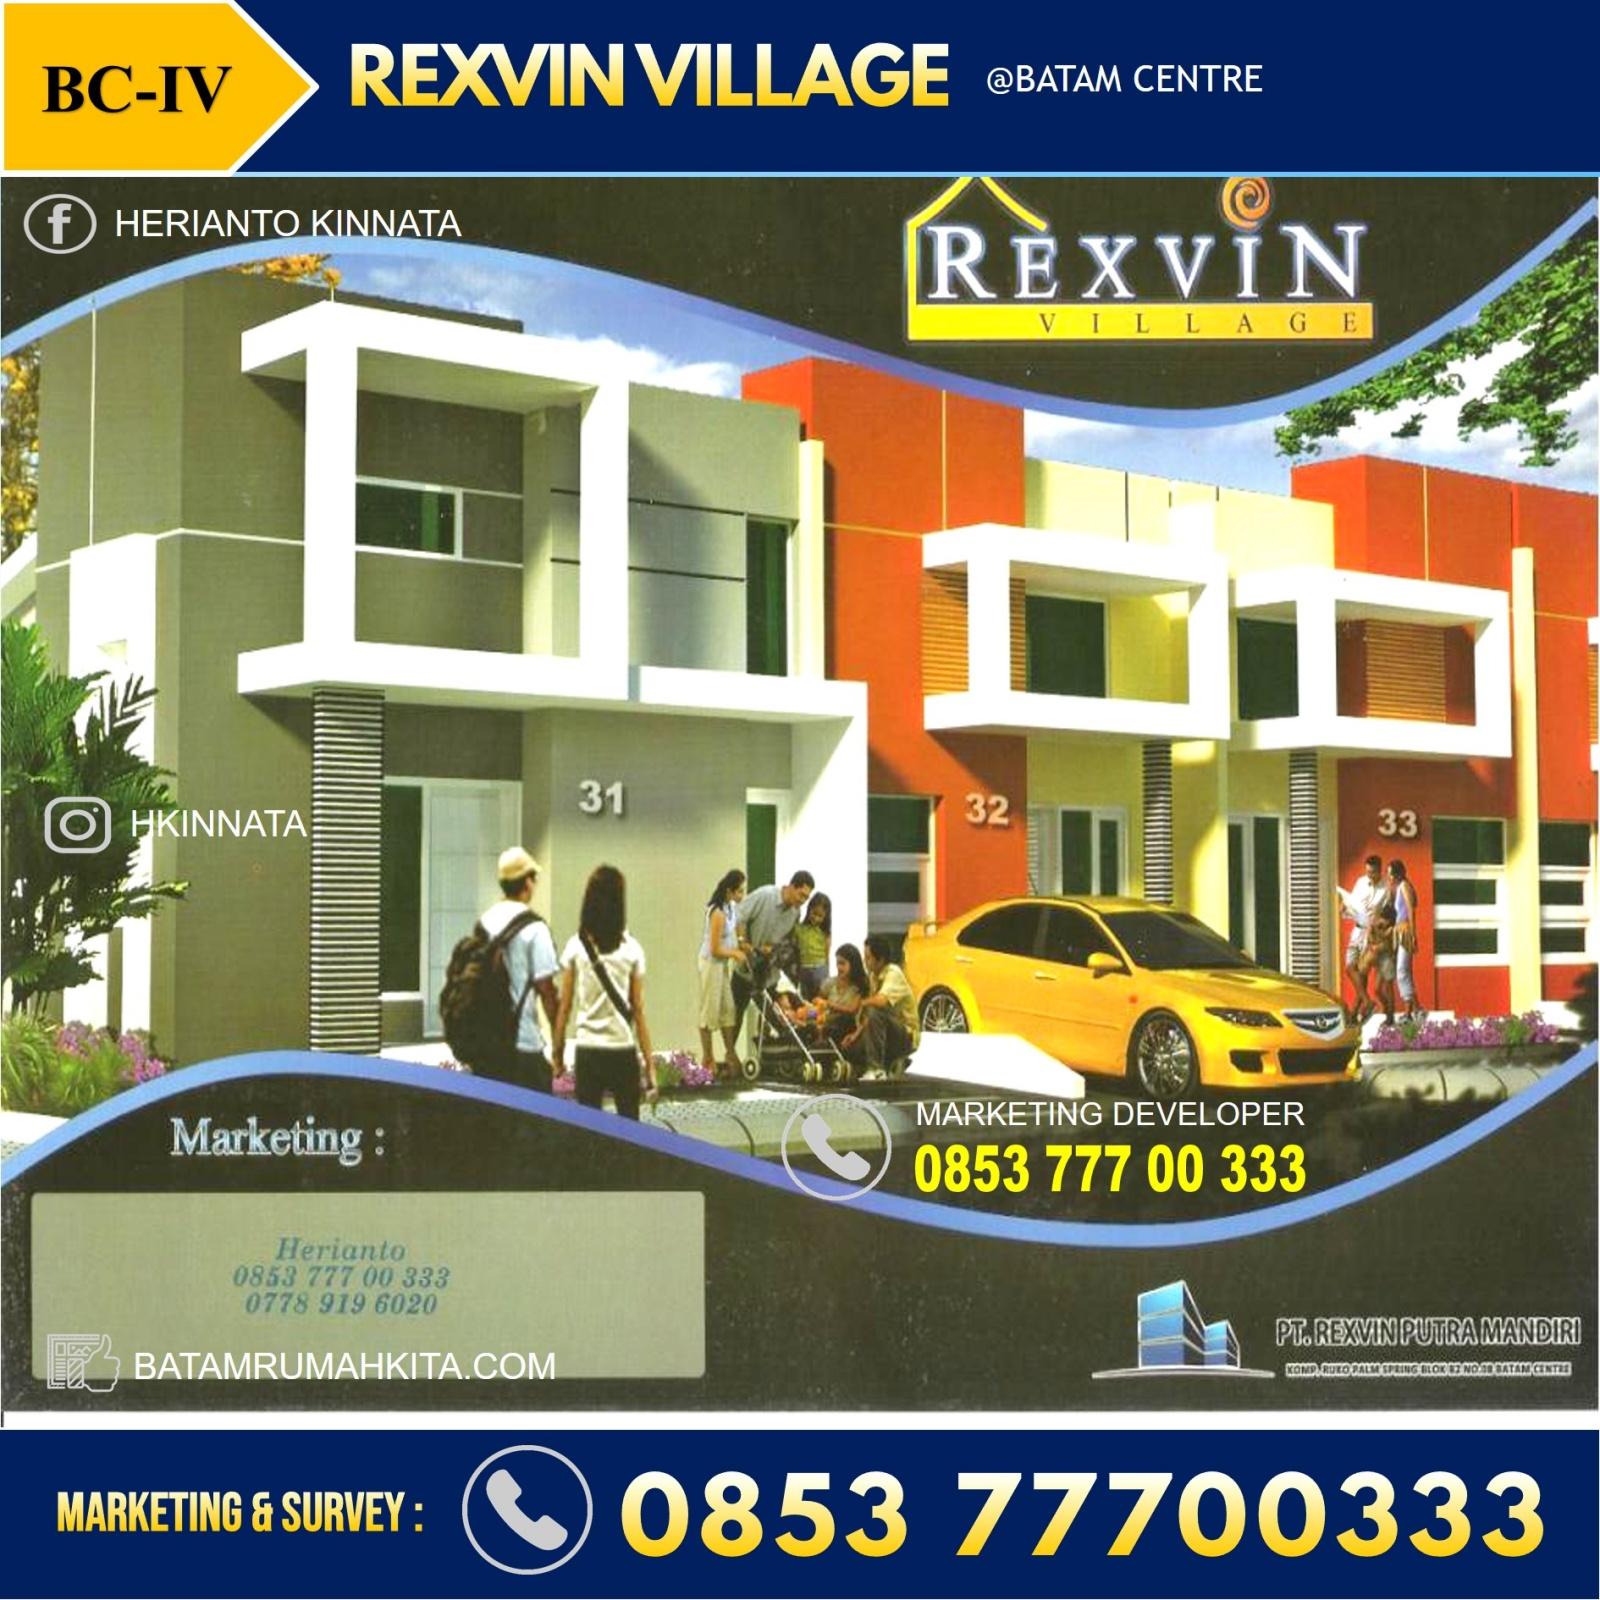 Brosur Rexvin Village Batam Centre